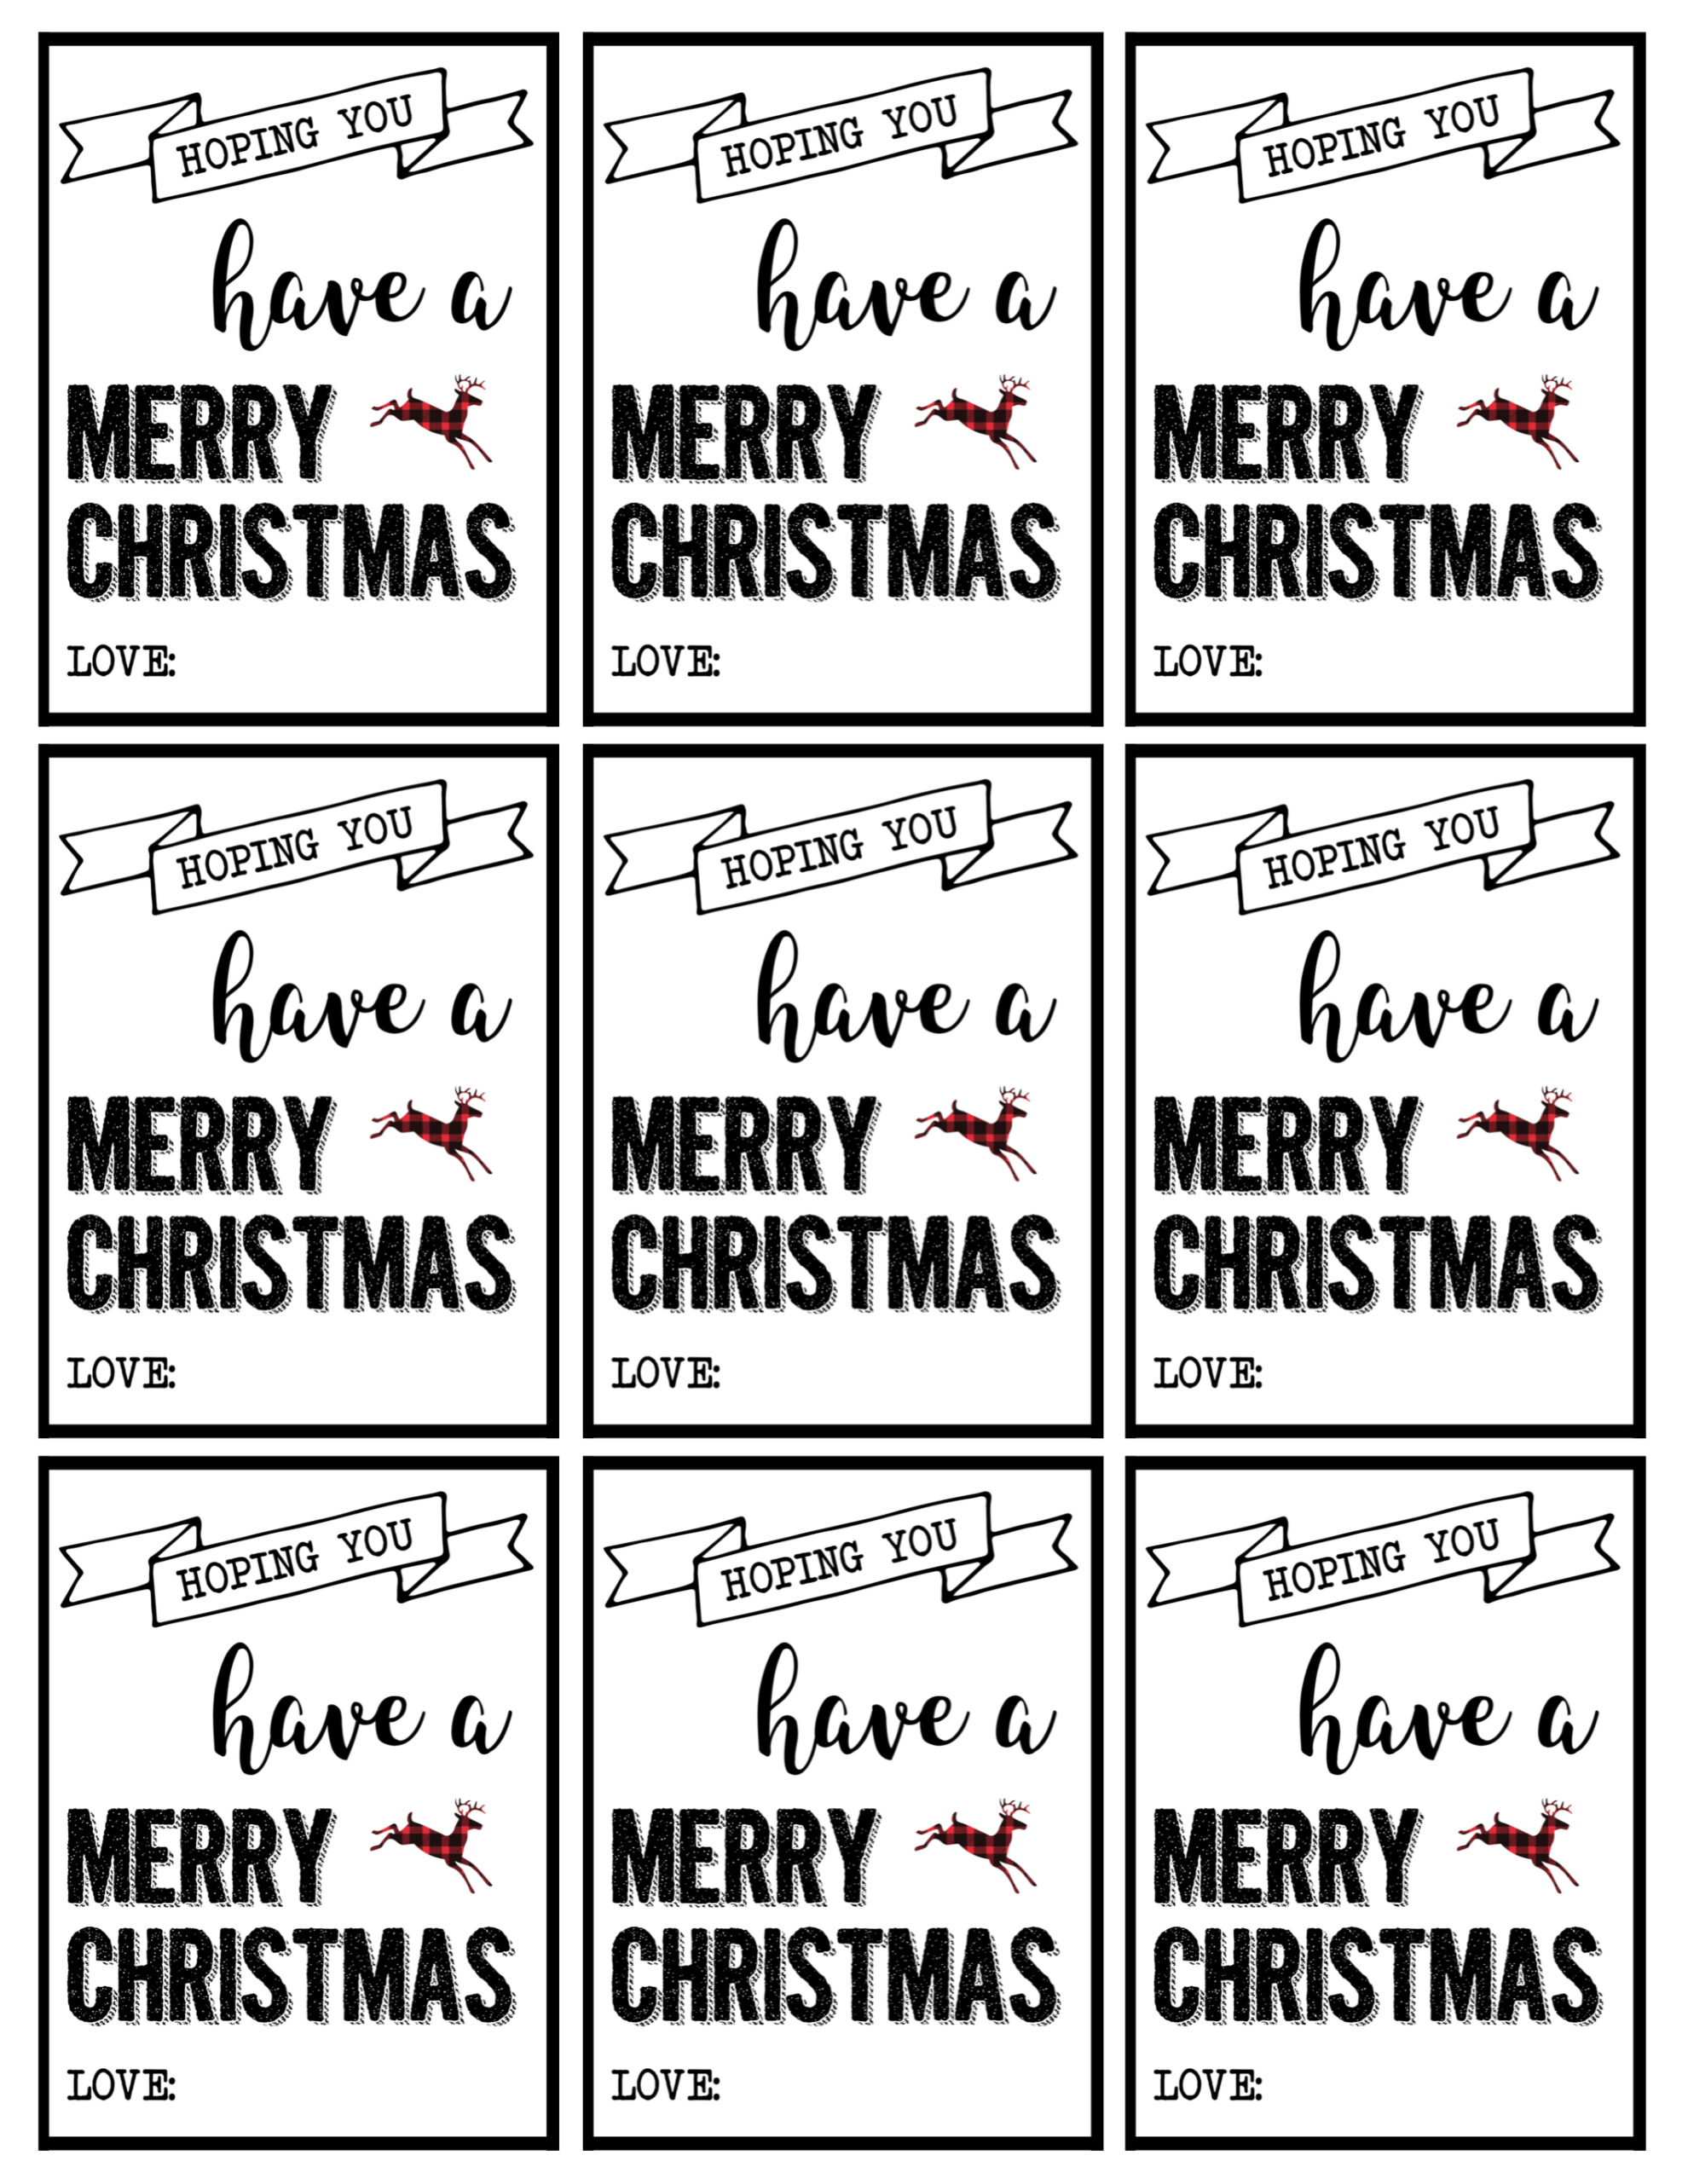 graphic relating to Free Printable Santa Tags identify Xmas Labels Printable Cost-free Xmas Reward Tags